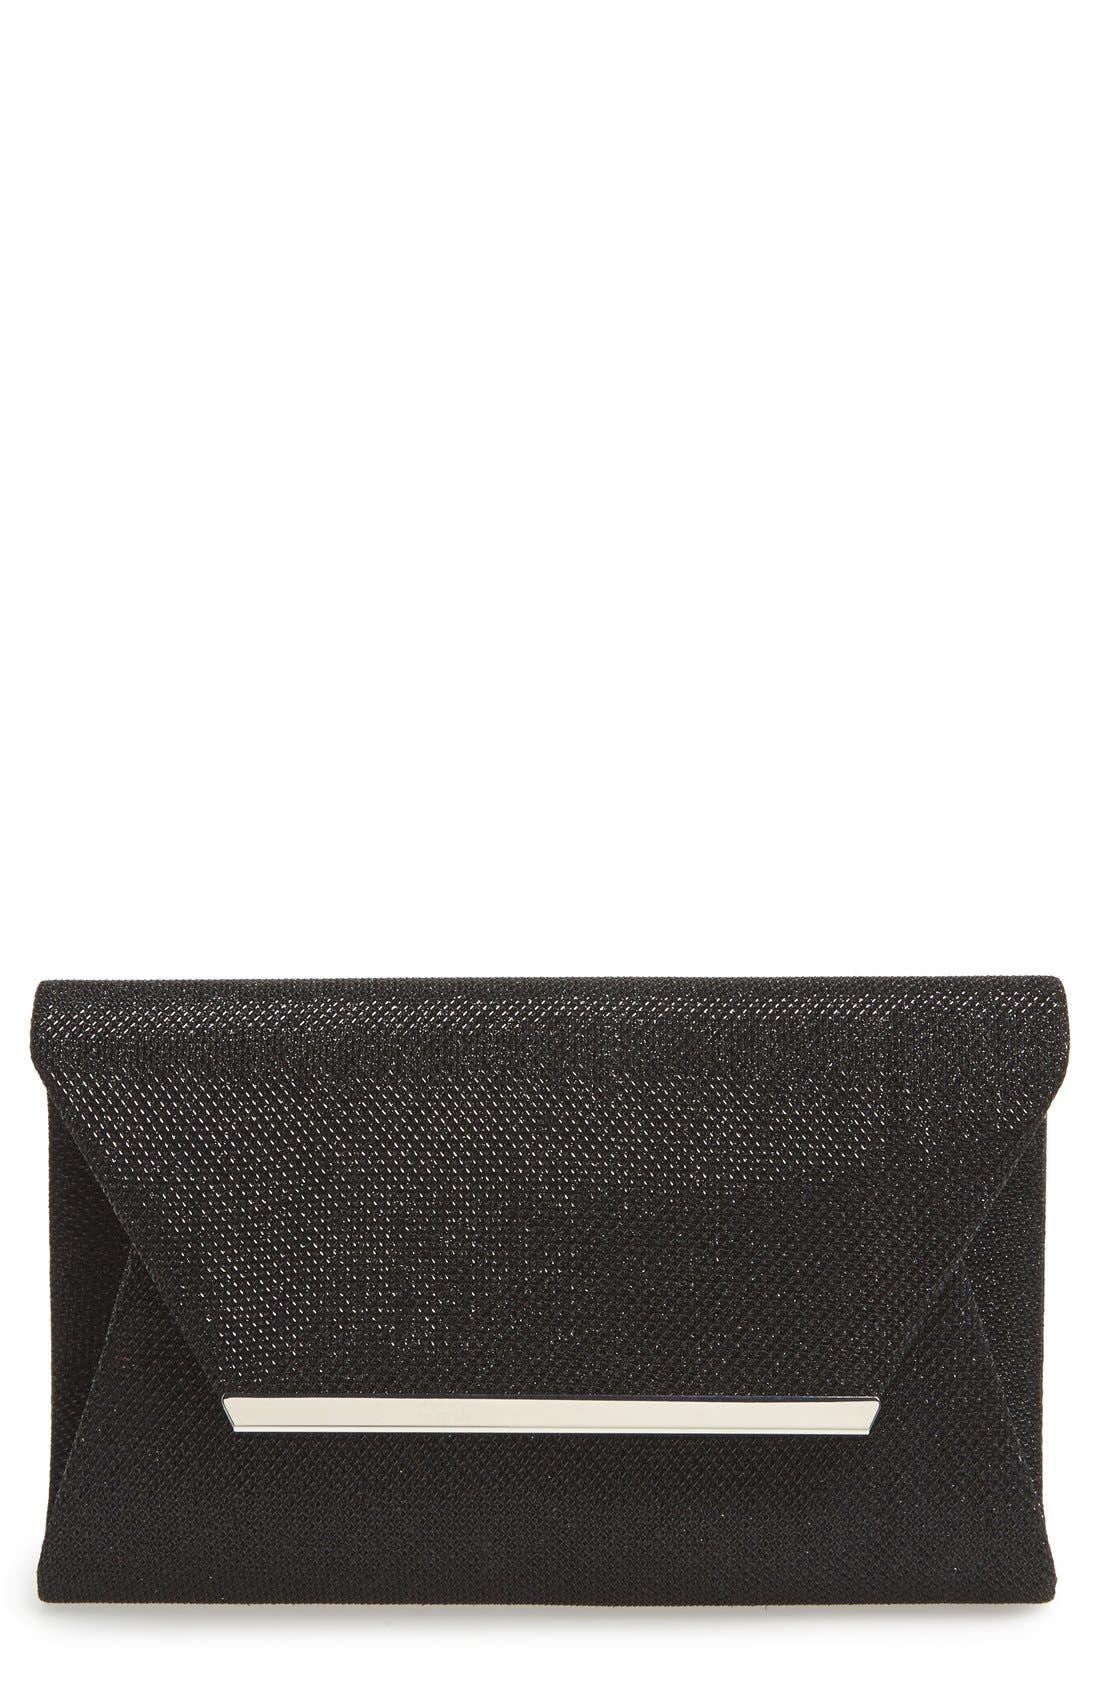 Metallic Envelope Clutch,                         Main,                         color, Black